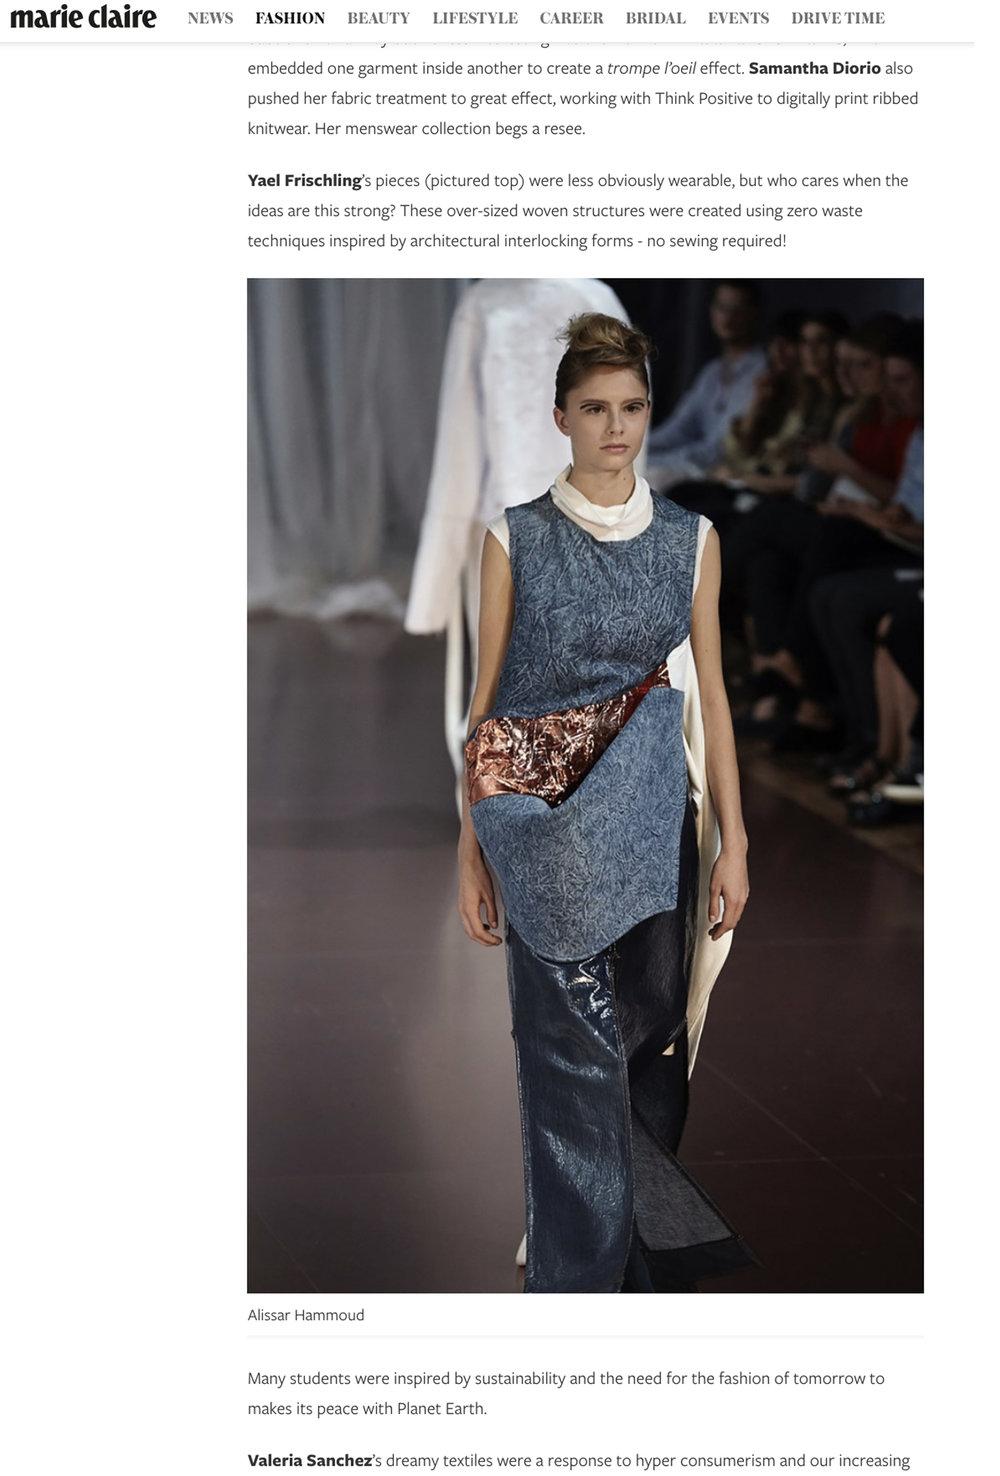 UTS FASHION CLASS OF 2017: Meet The Next Gen Fashion Disruptors